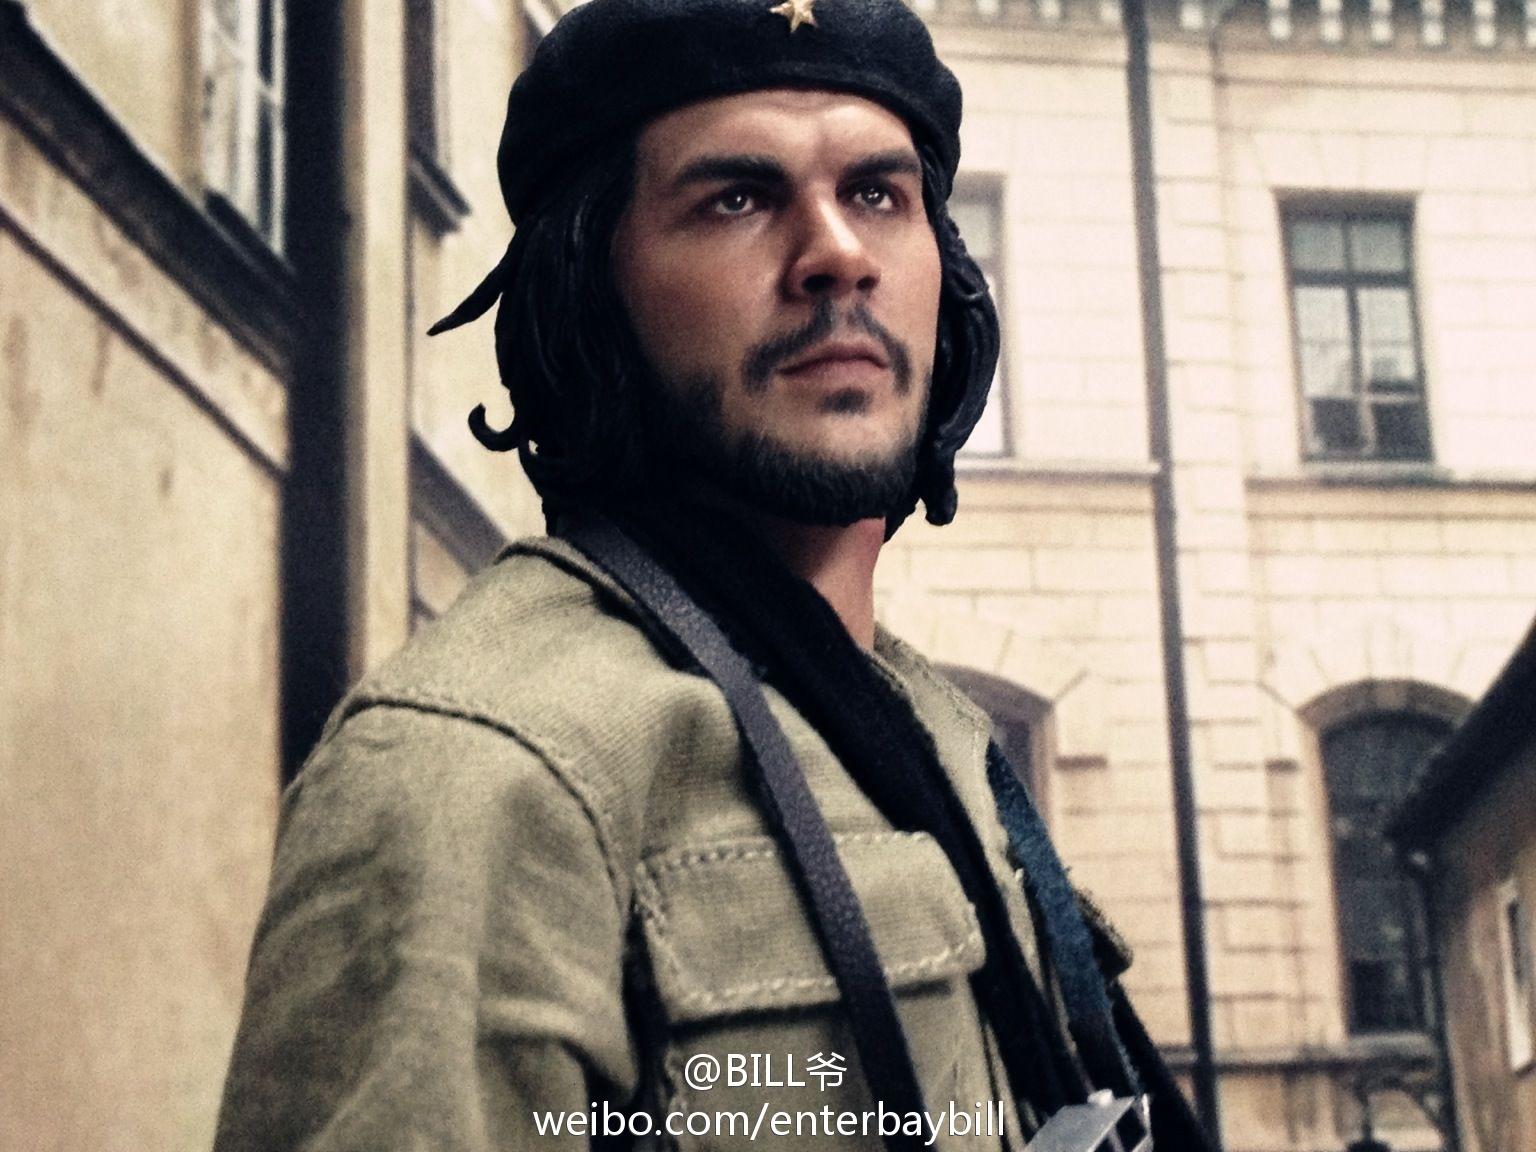 [Enterbay] Che Guevara - 1/6 Scale Collectible Figure - Página 2 69464edejw1dqhvyfvzr3j